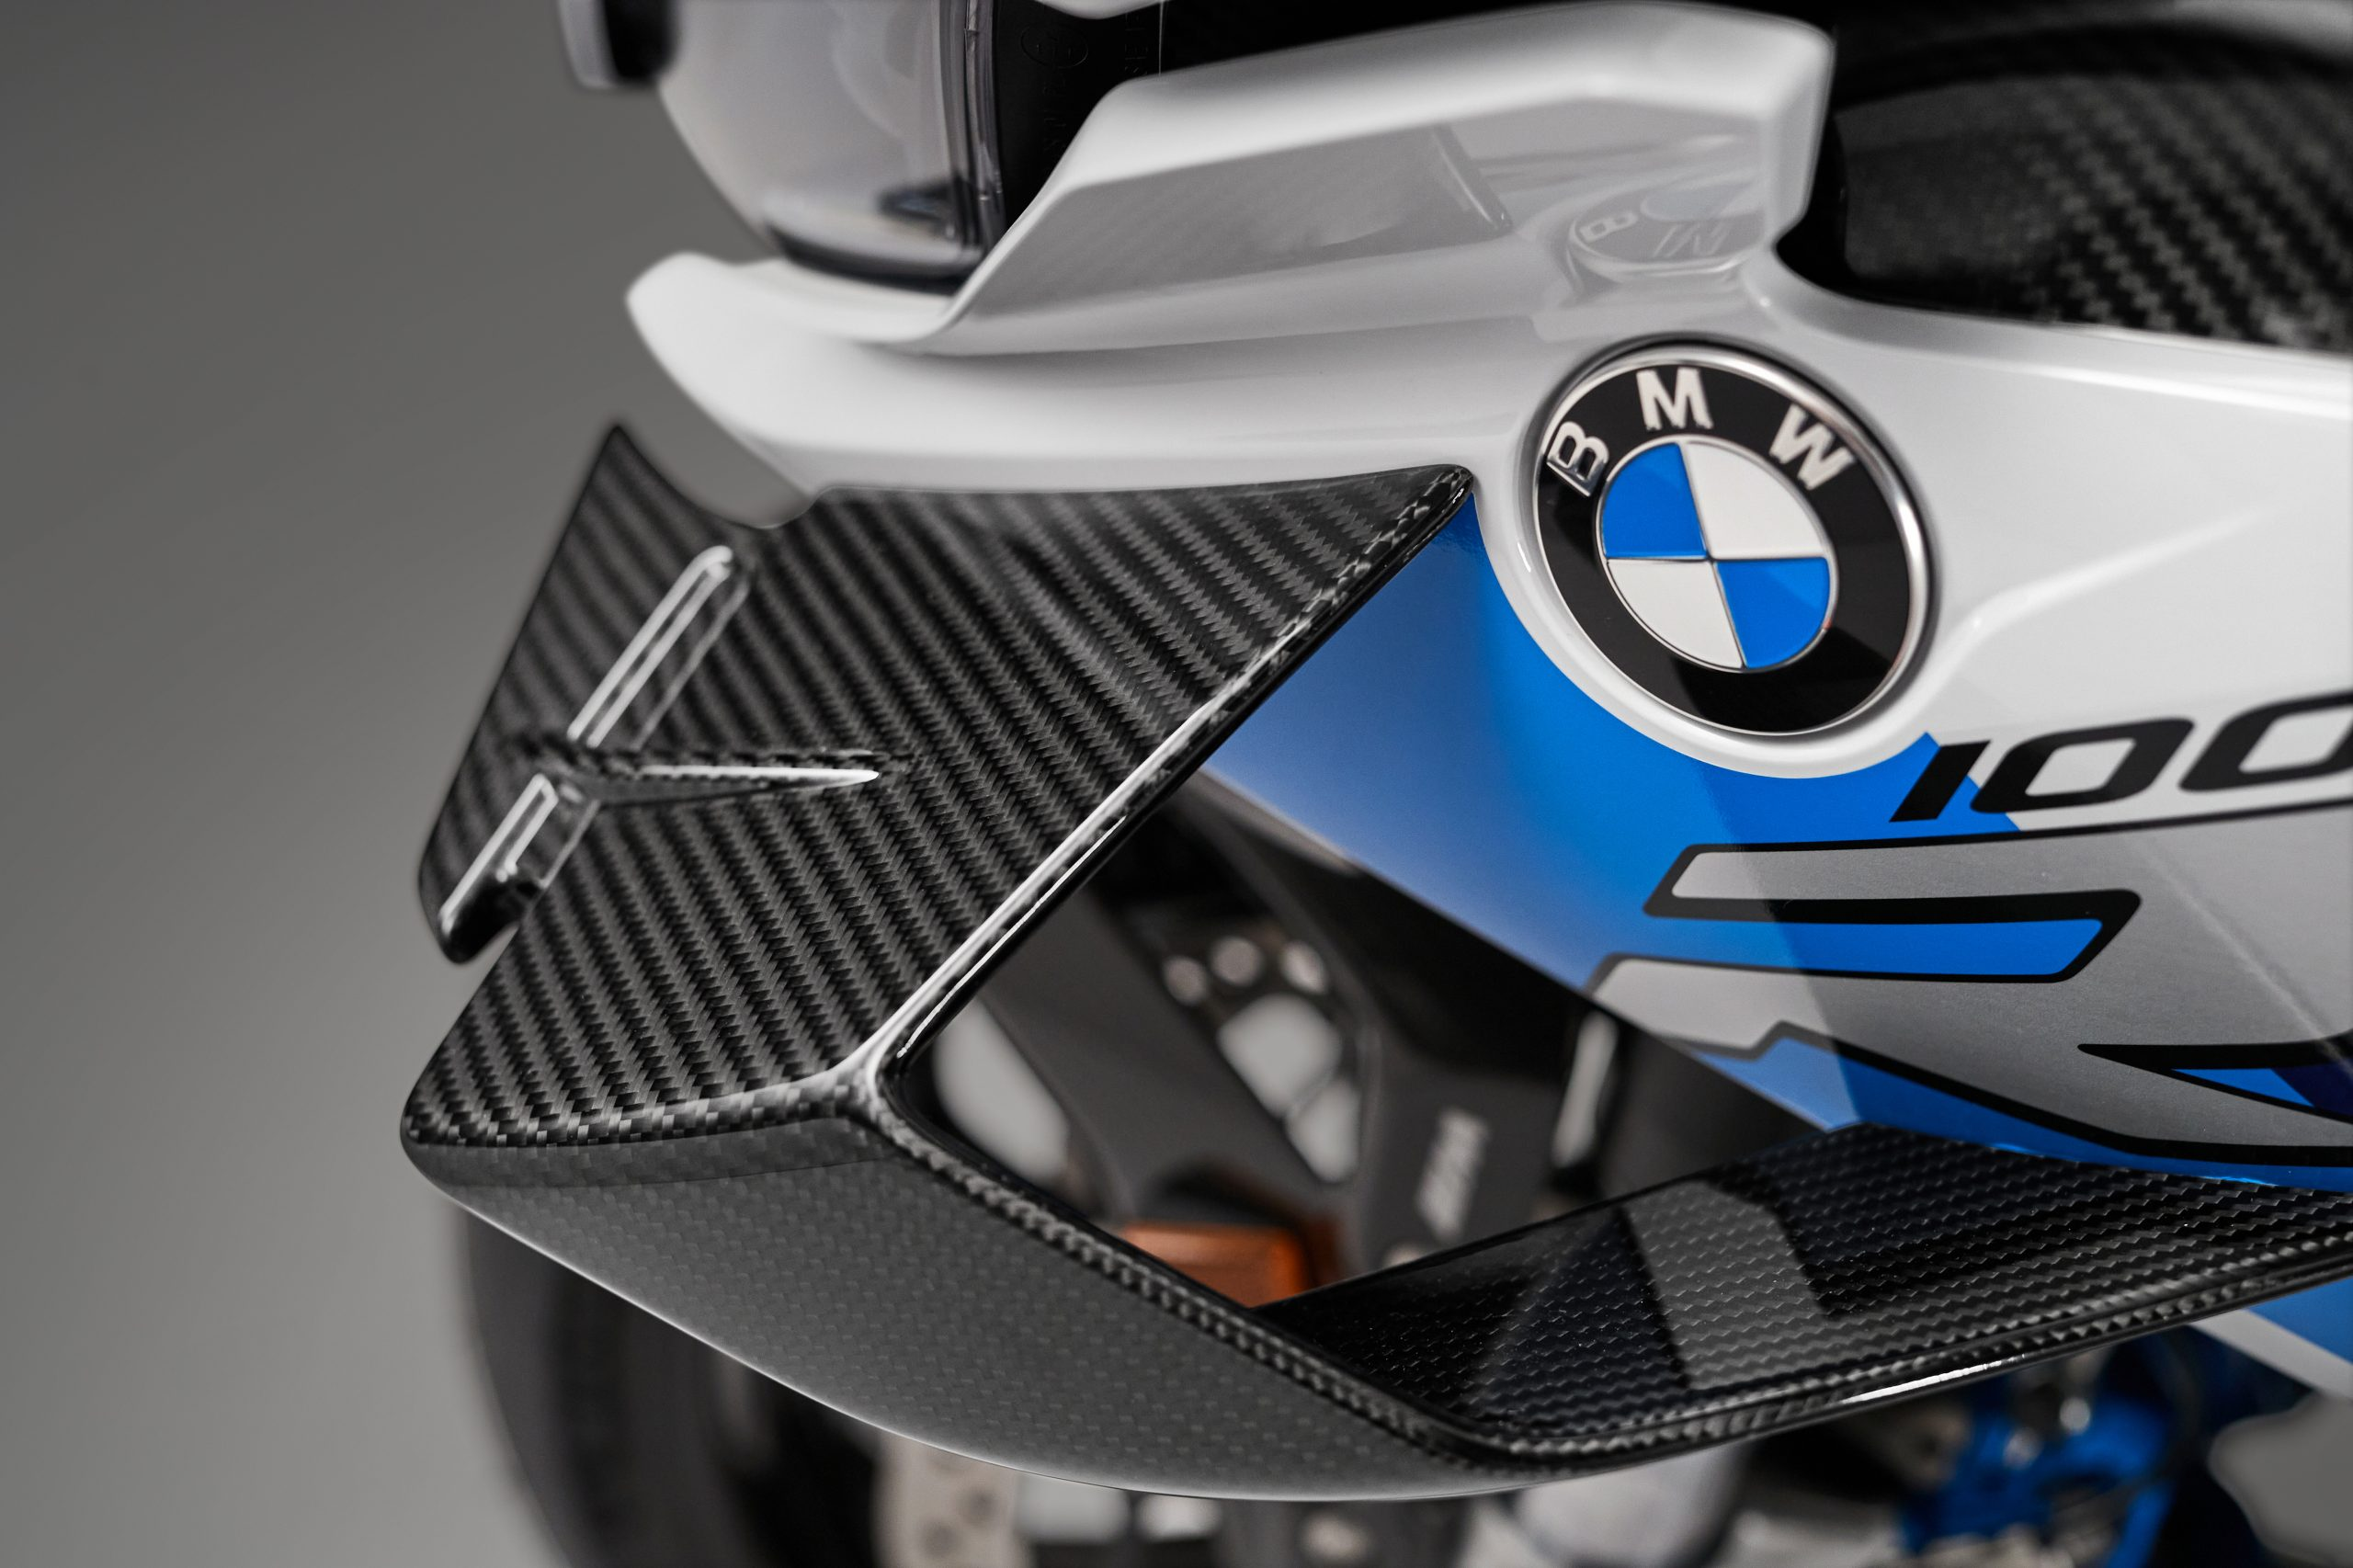 BMW M 1000RR wing detail